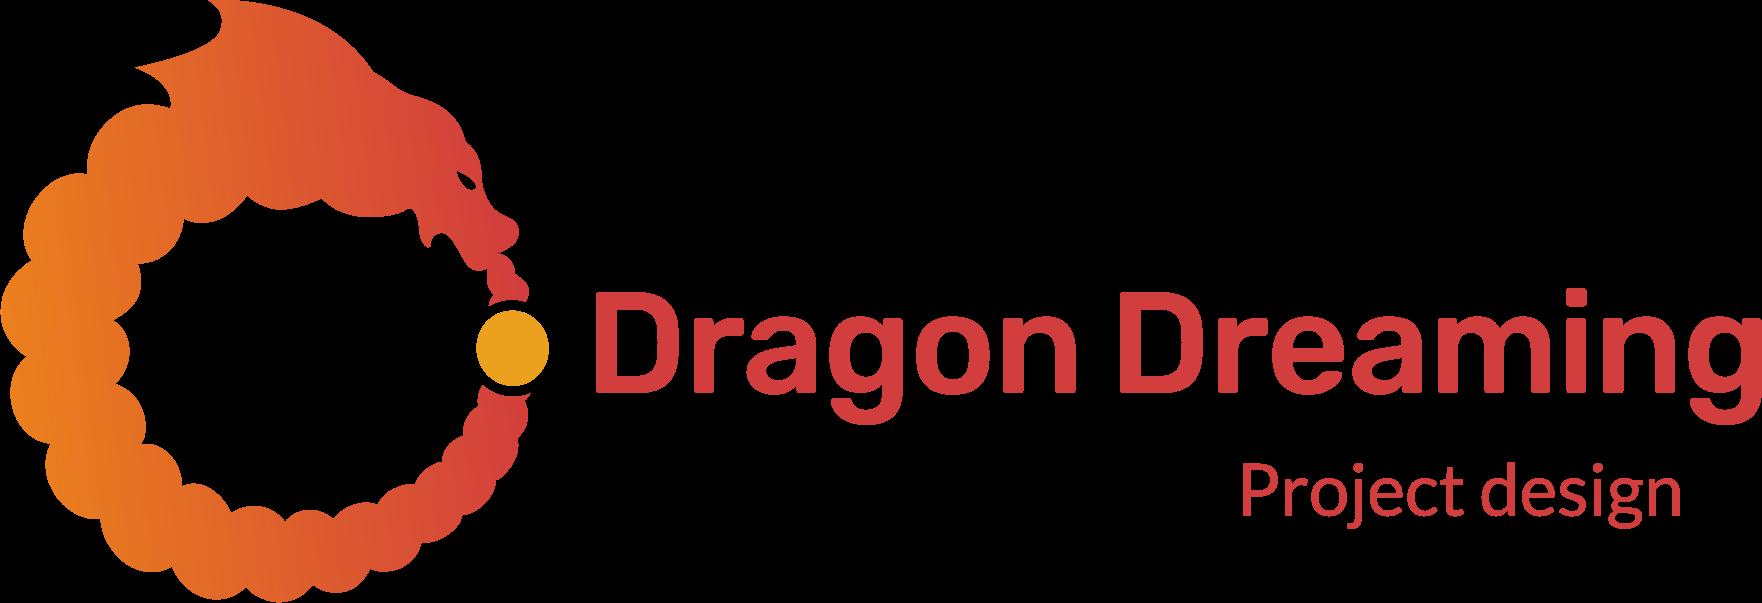 www.revedudragon.org